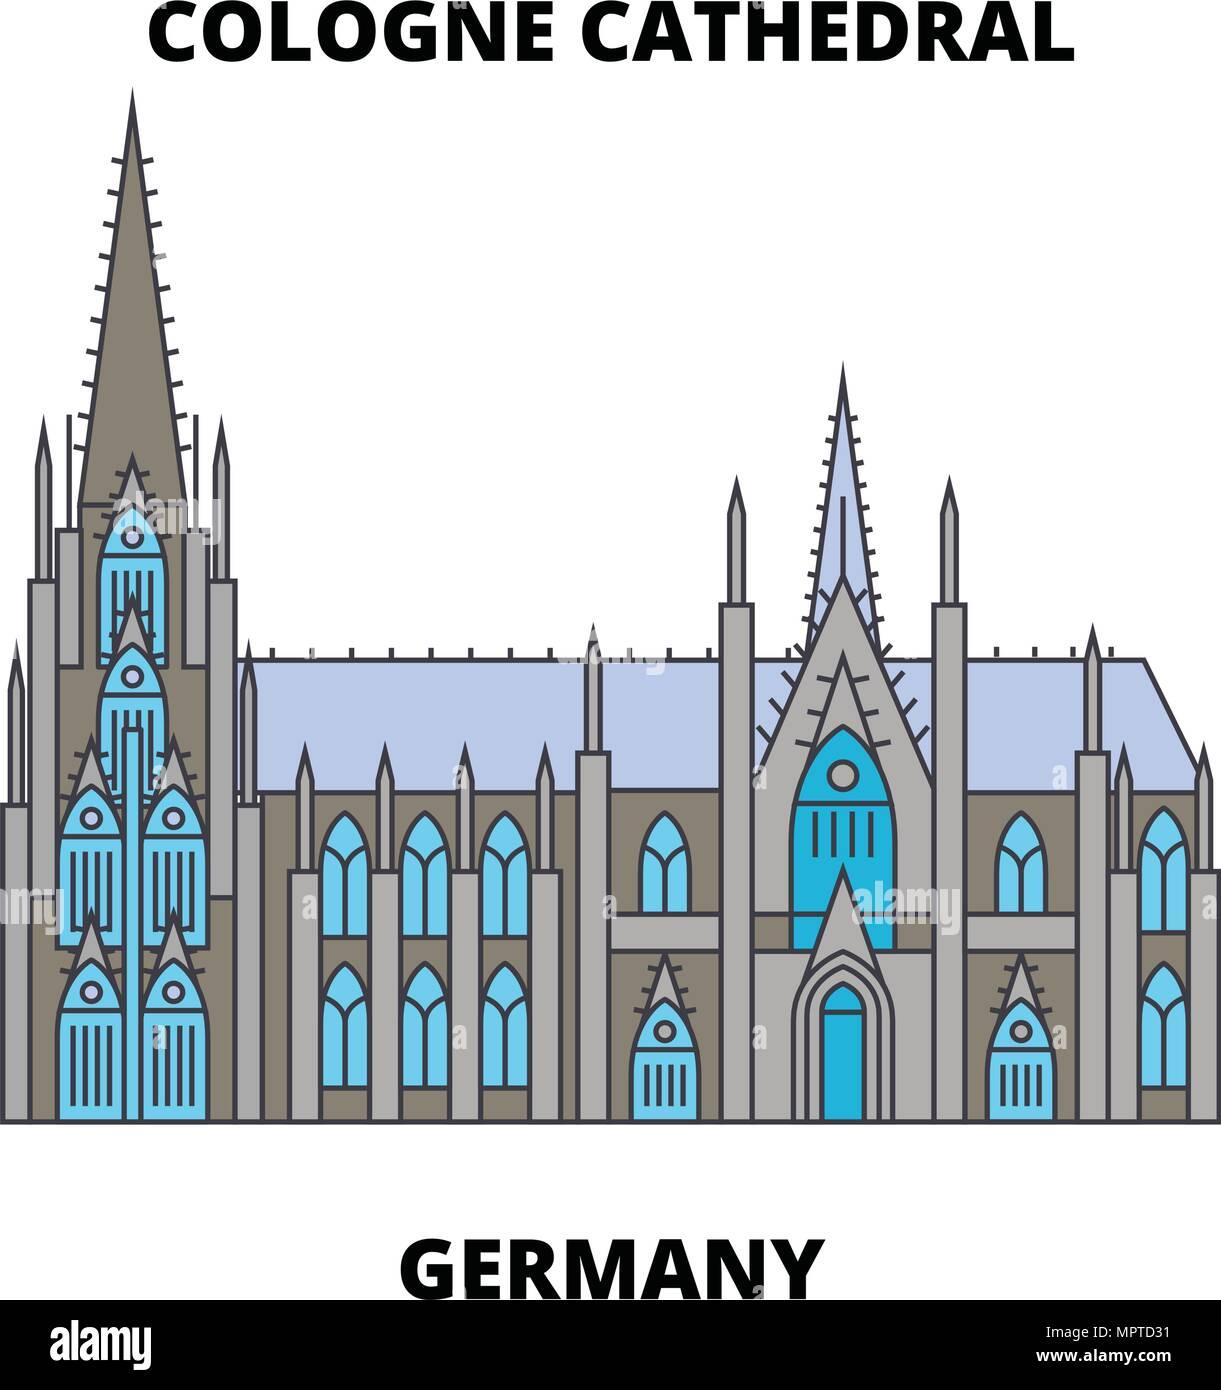 Kolner Dom Deutschland Symbol Leitung Konzept Der Kolner Dom Deutschland Wohnung Vektor Zeichen Symbol Abbildung Stock Vektorgrafik Alamy